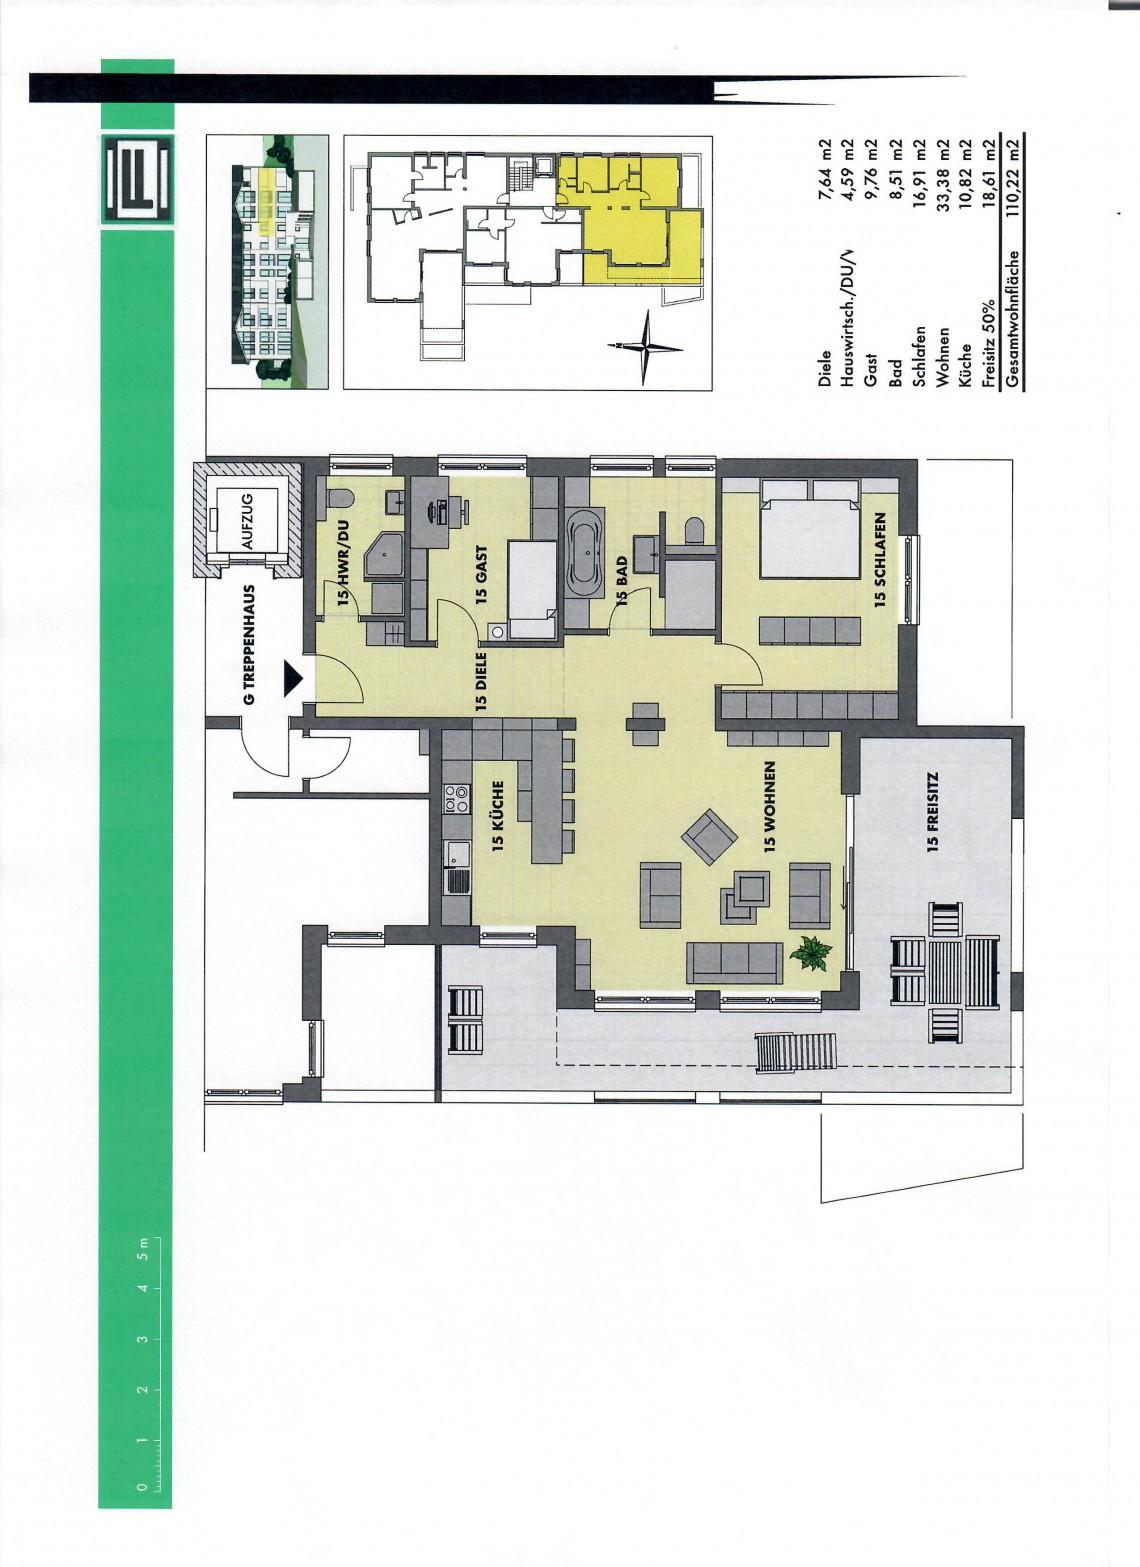 Haus 2 Whg. 15